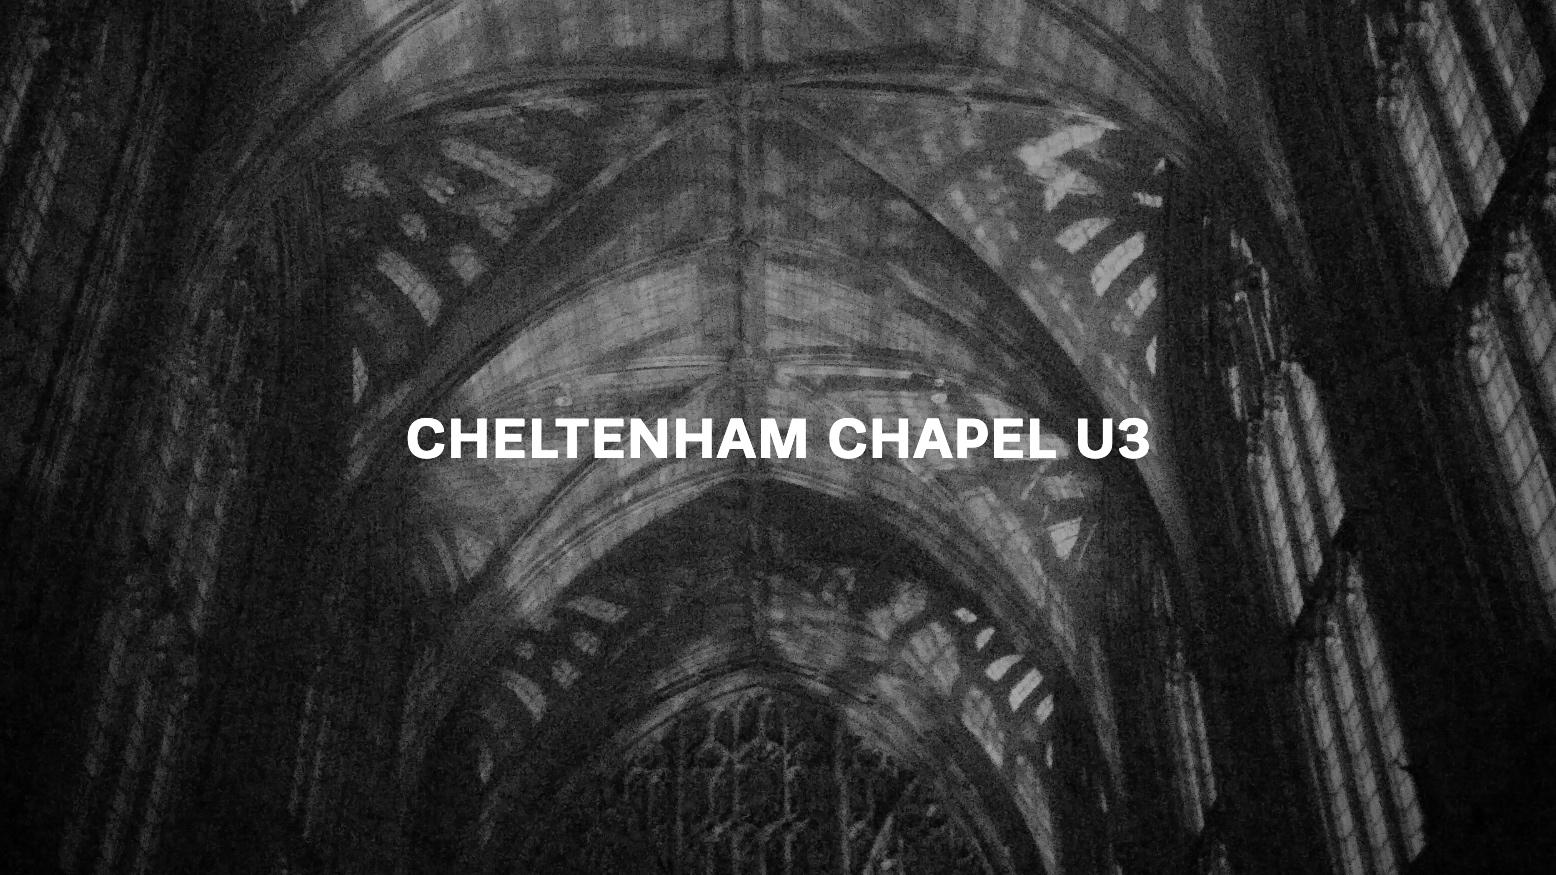 Cheltenham Chapel U3 Text.jpg